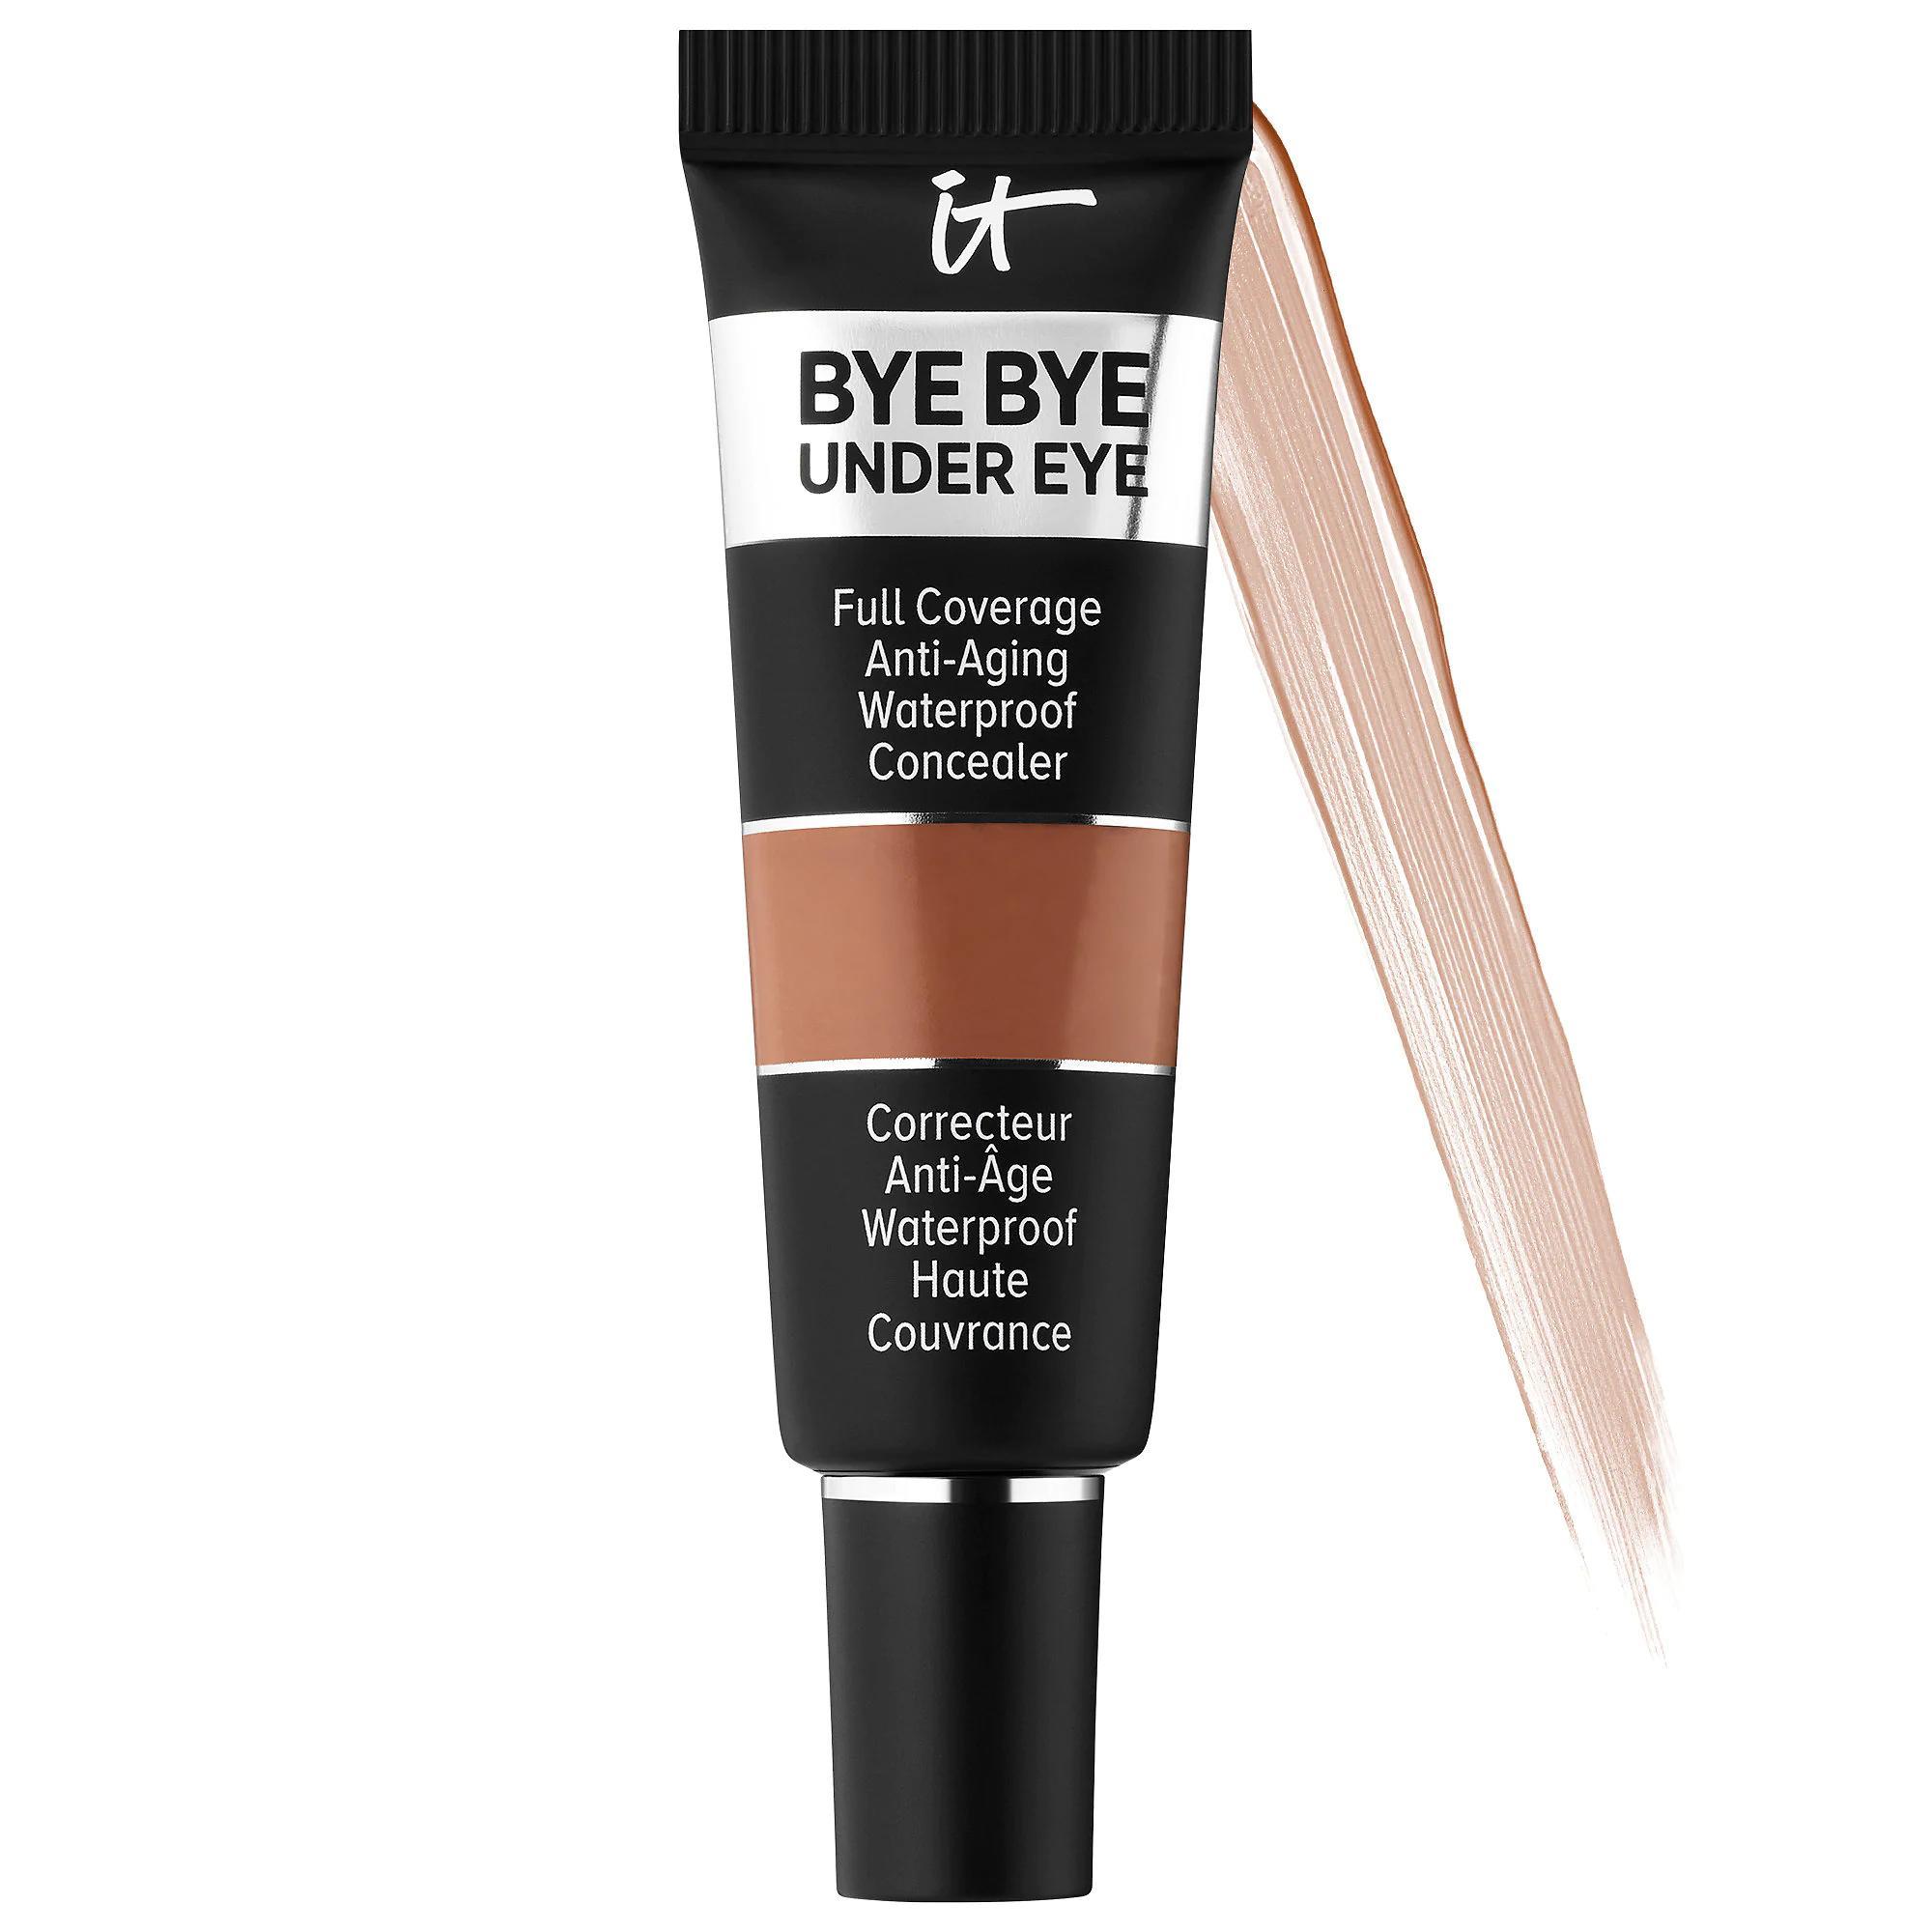 IT Cosmetics Bye Bye Under Eye Full Coverage Concealer Deep Golden 41.5